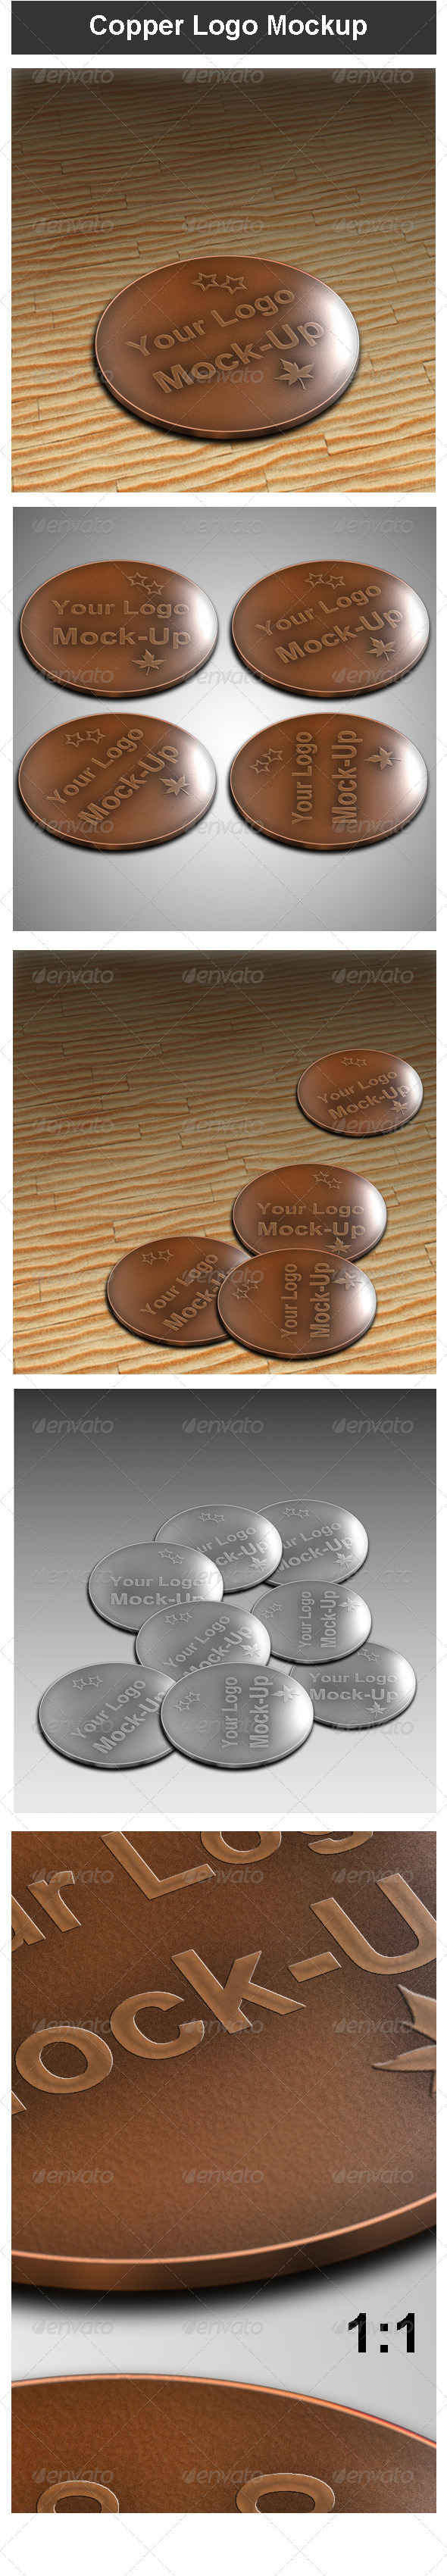 Copper Logo Mock-up - Logo Product Mock-Ups